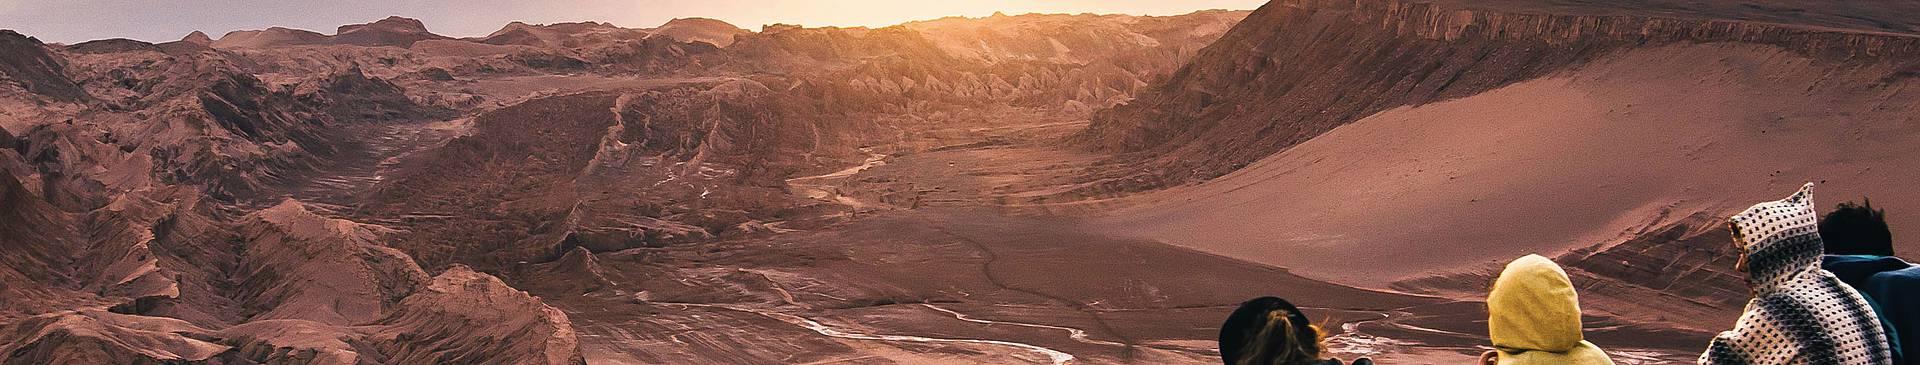 Naturreisen Chile